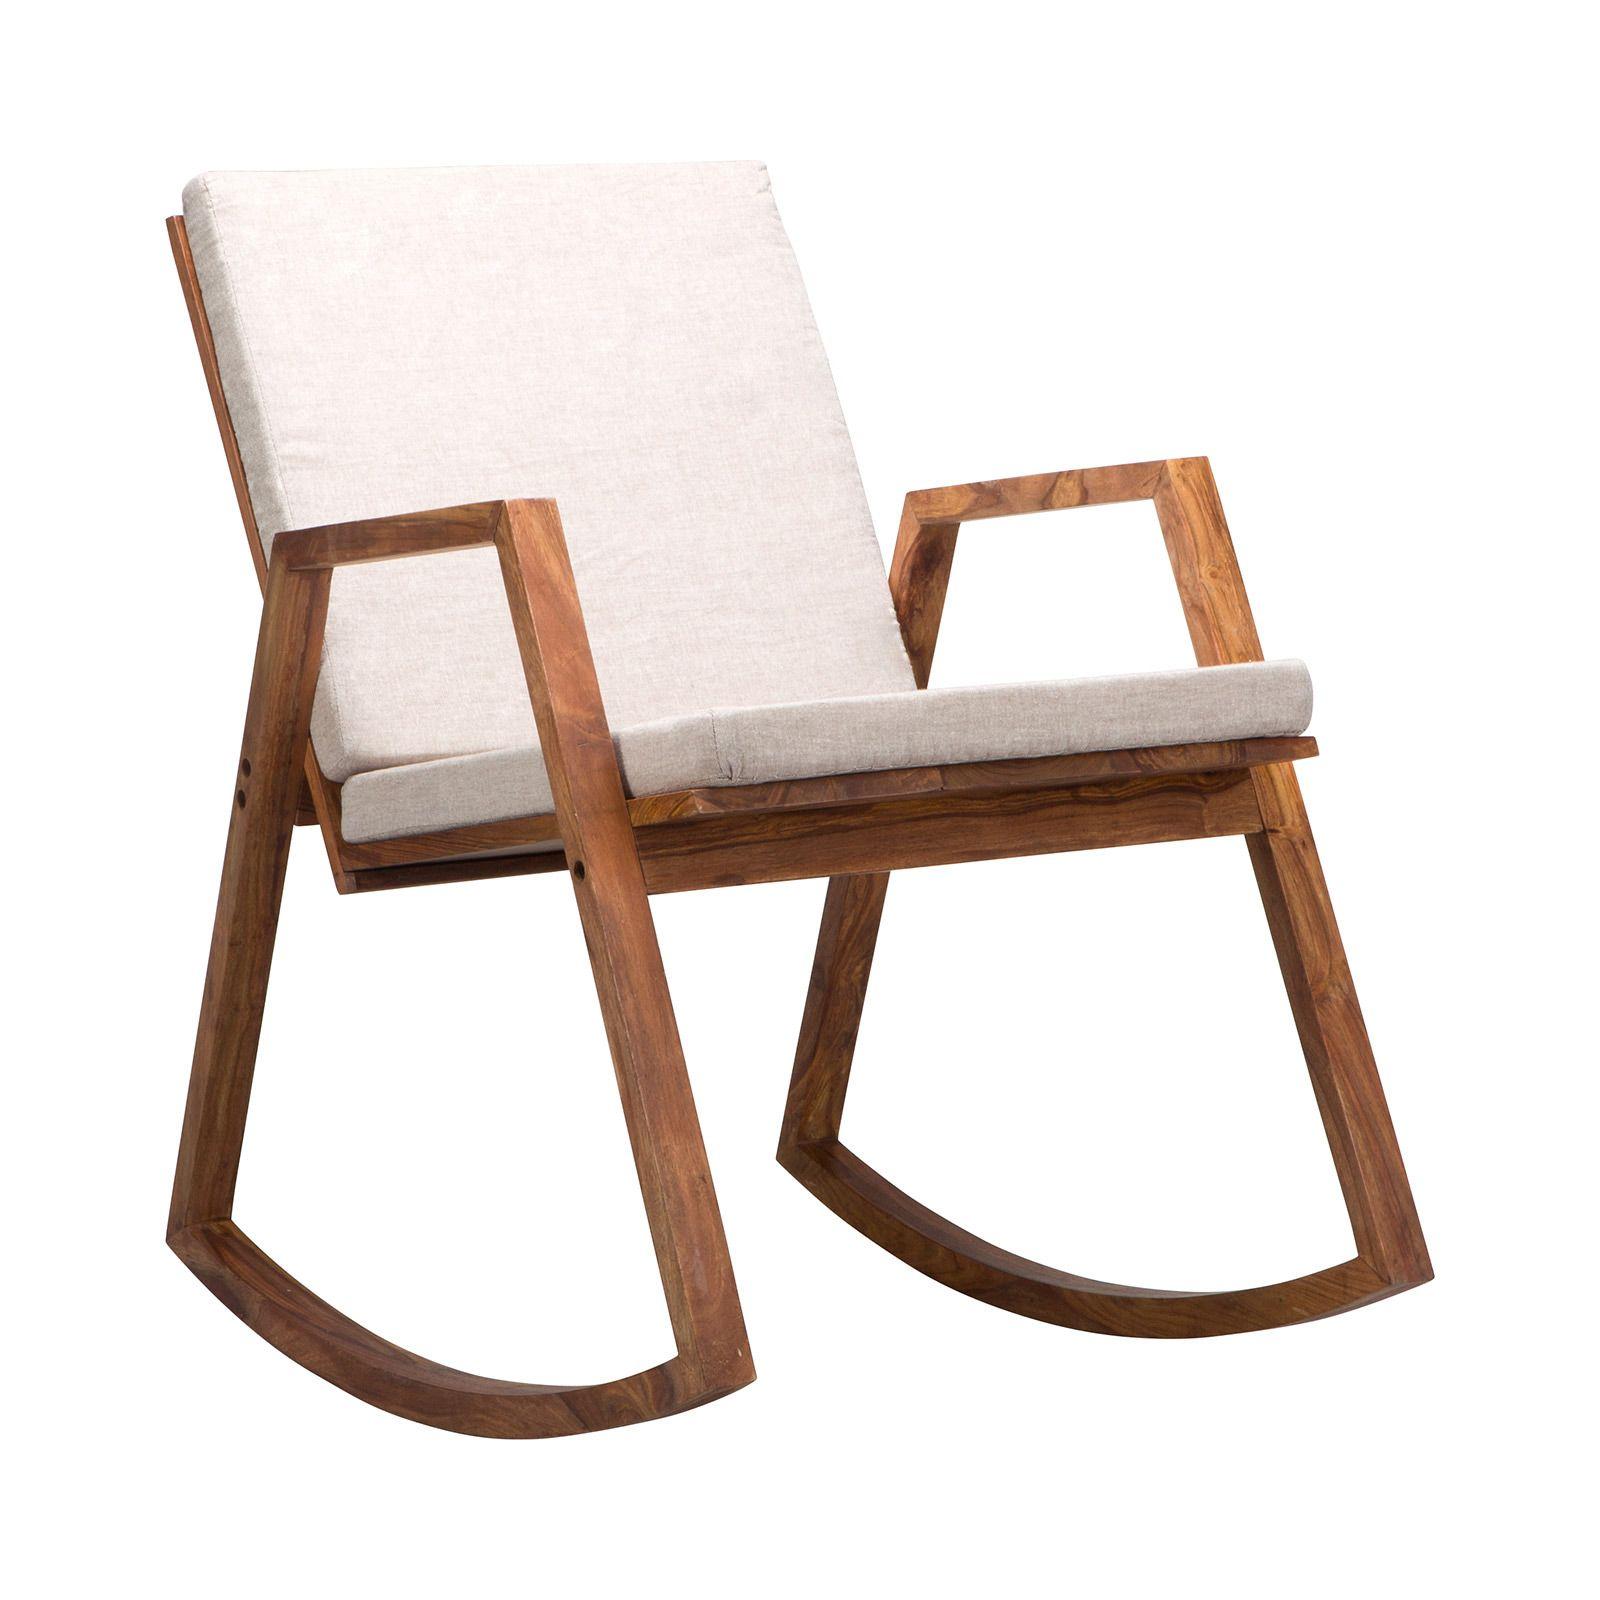 Terrific Furniture And Decor For The Modern Lifestyle Modern Inzonedesignstudio Interior Chair Design Inzonedesignstudiocom